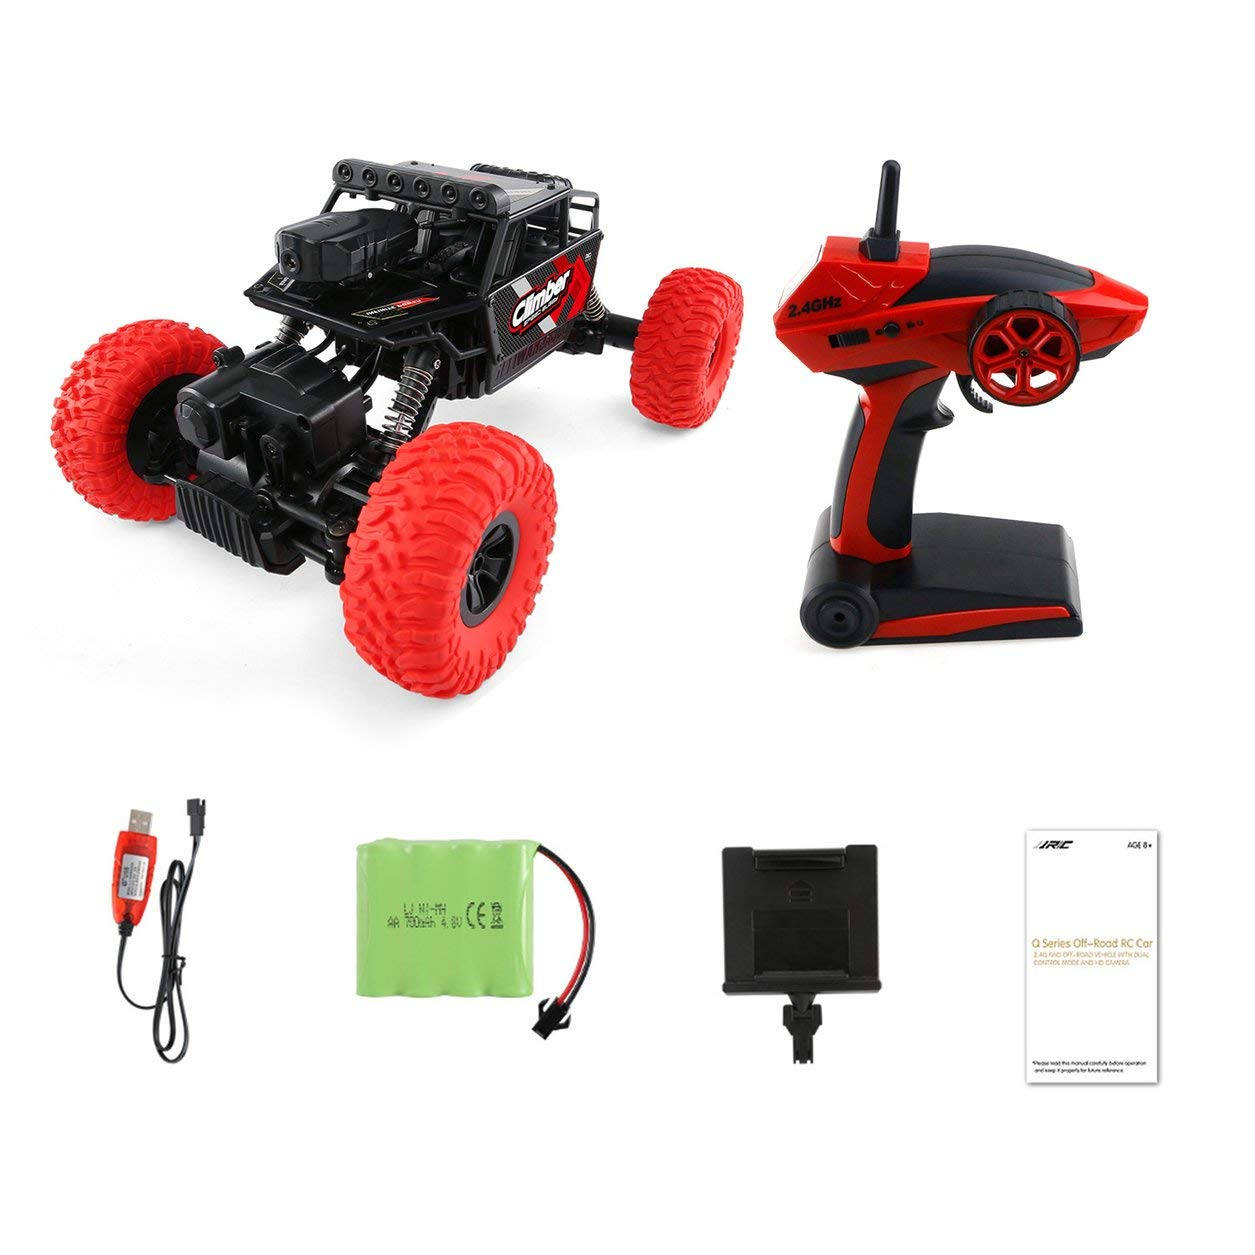 Dailyinshop Q45 RC-Rennwagen 4WD 2.4GHz Mini-Off-Road Fern Spielzeug mit WiFi FPV Kamera